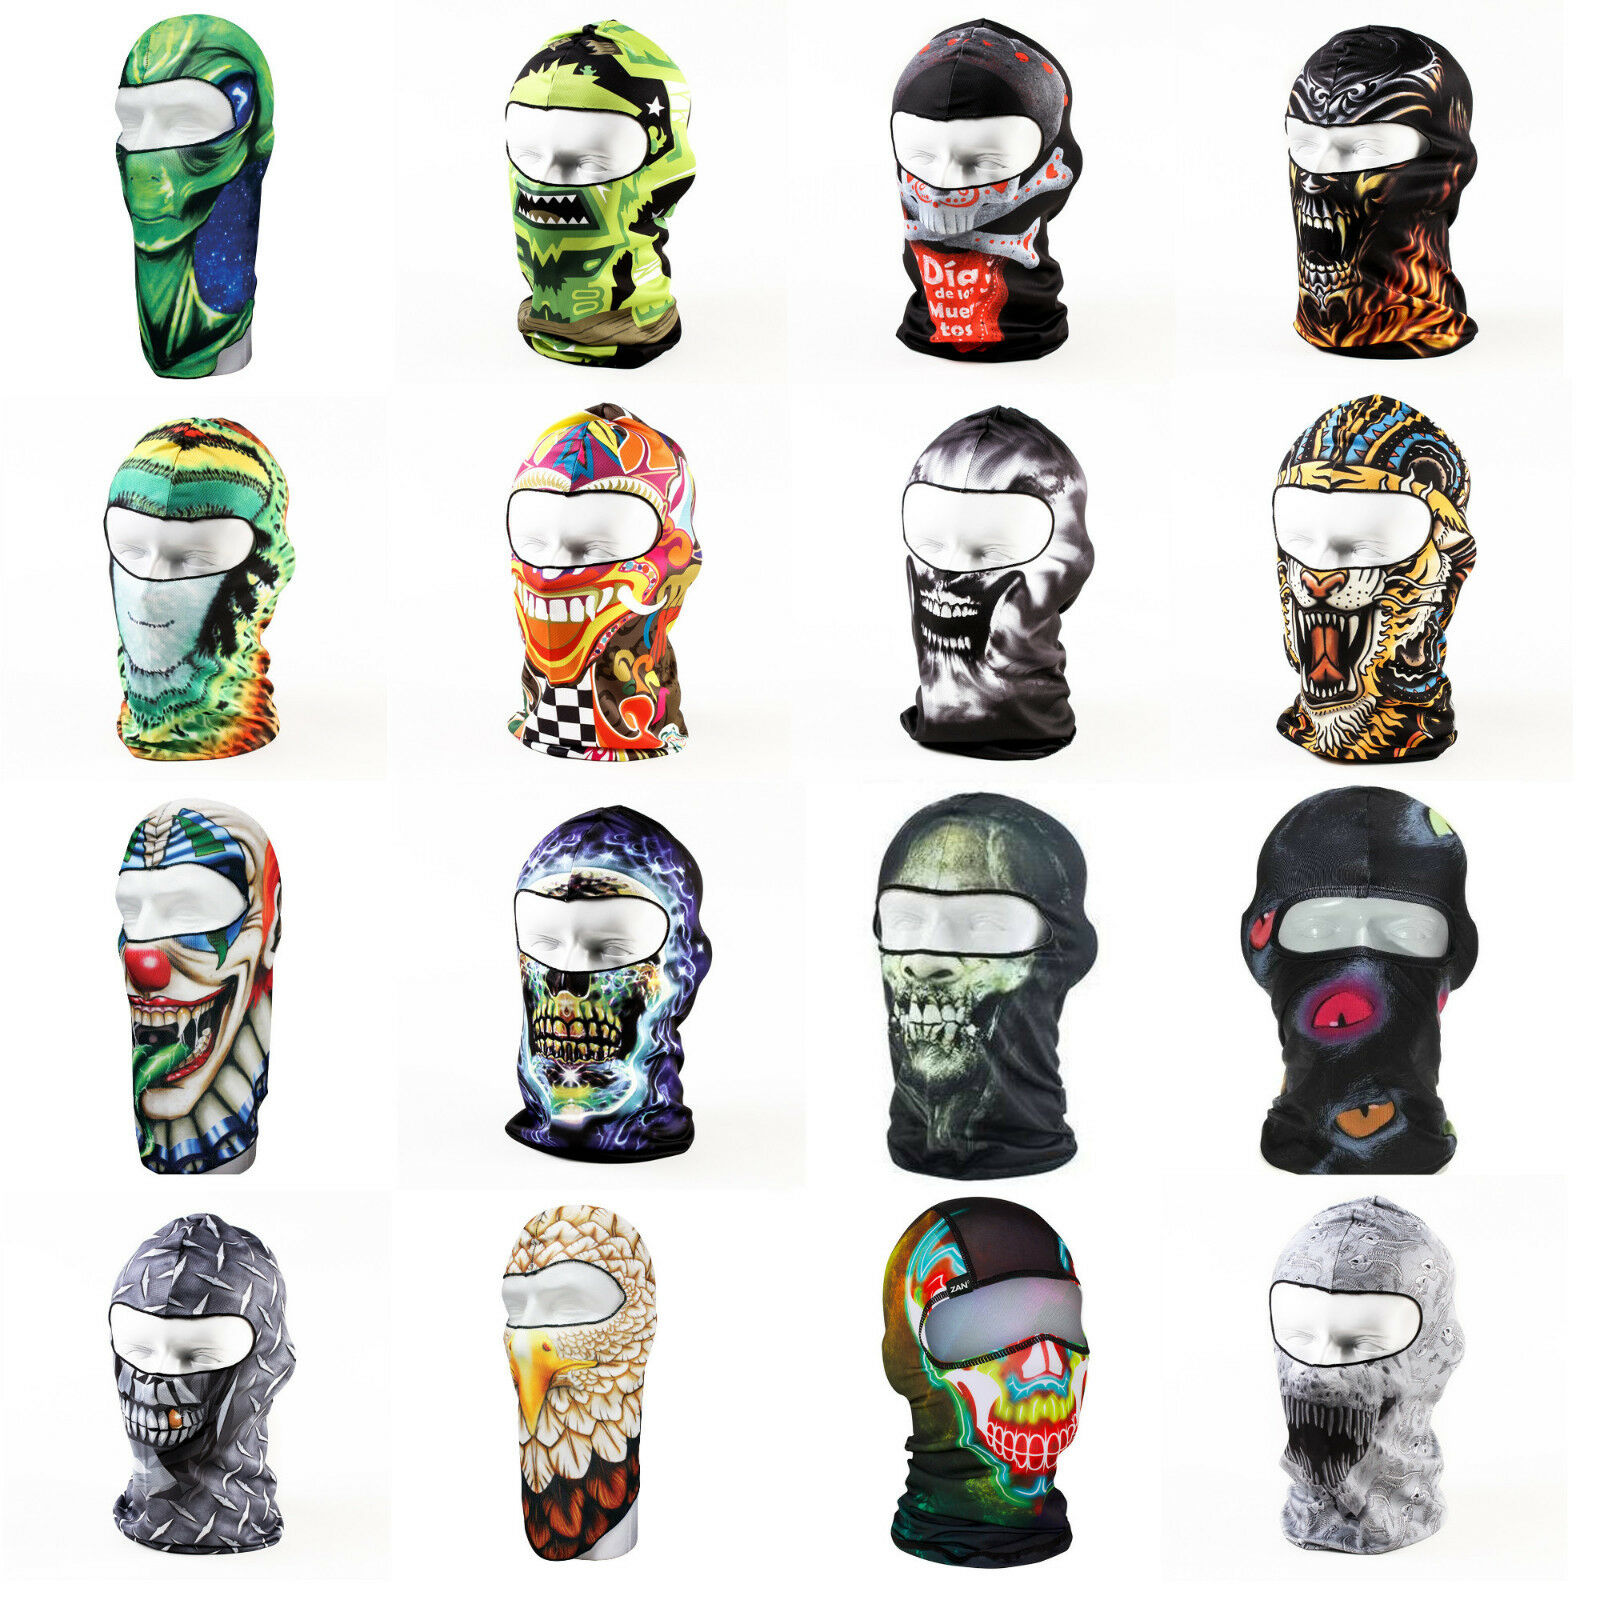 Graphic Winter Monster Animal Biker Motorcycle Full Face Ski Mask Balaclava